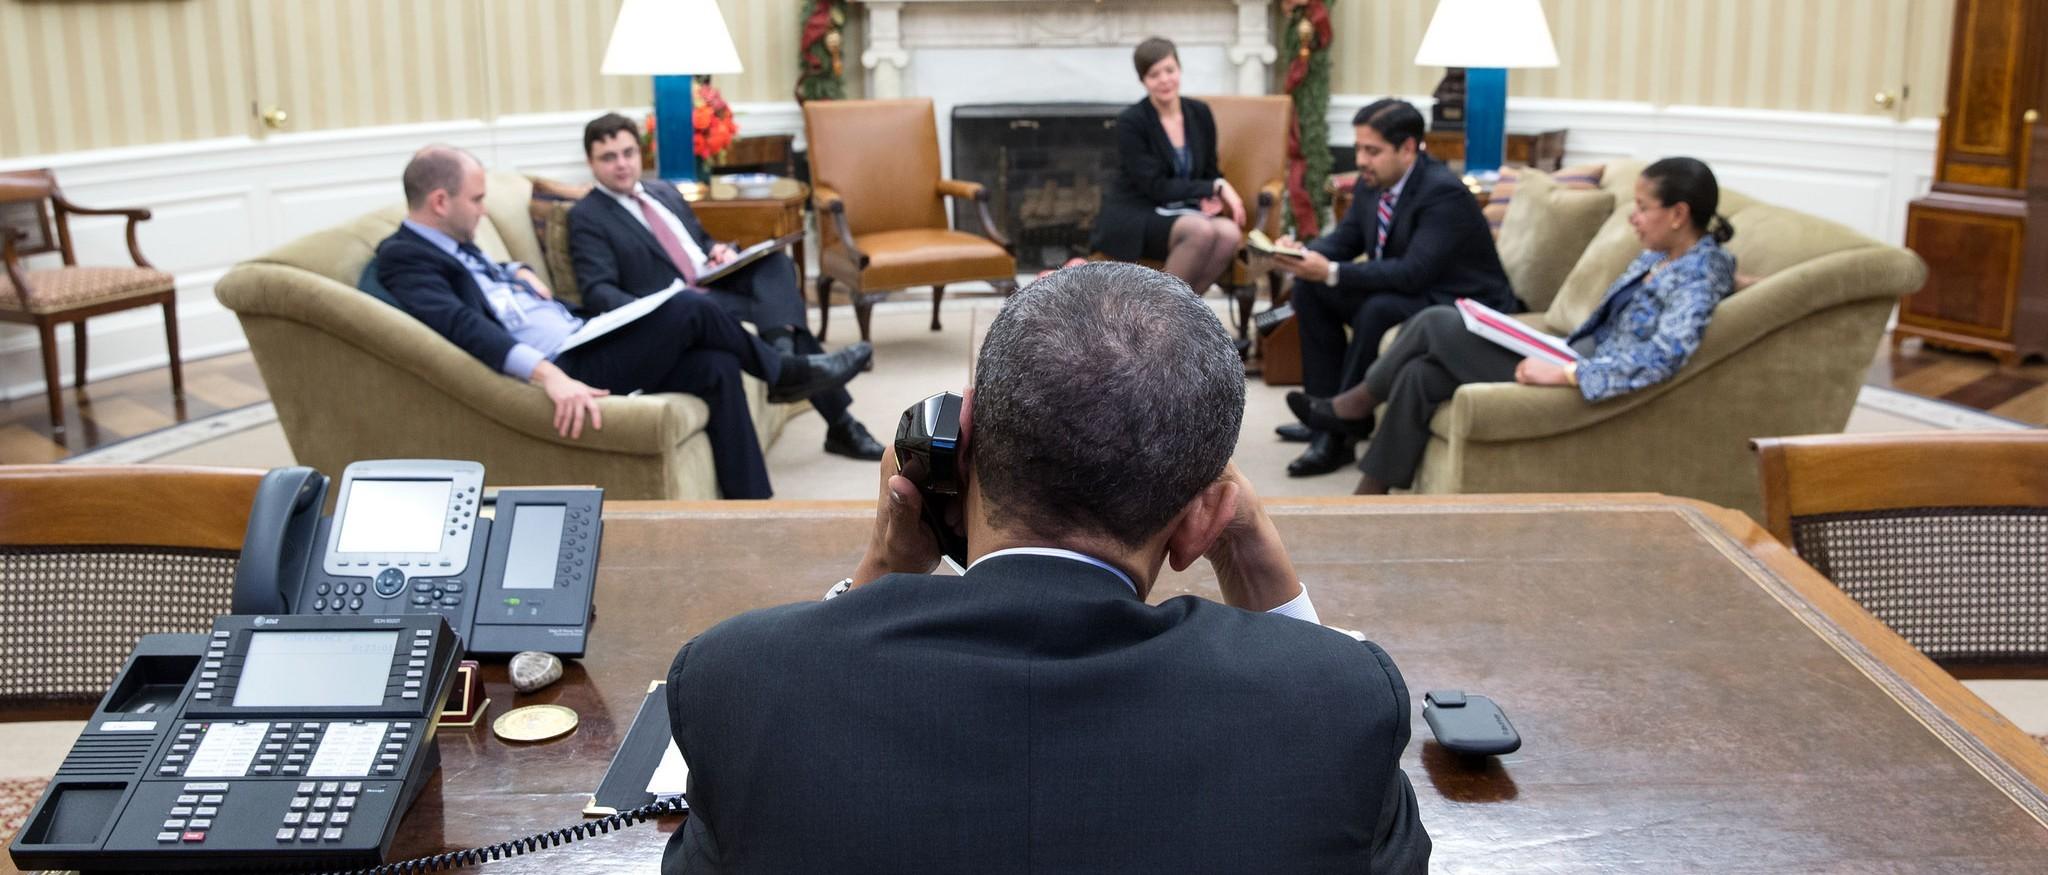 Pete Souza | Official White House (cc)